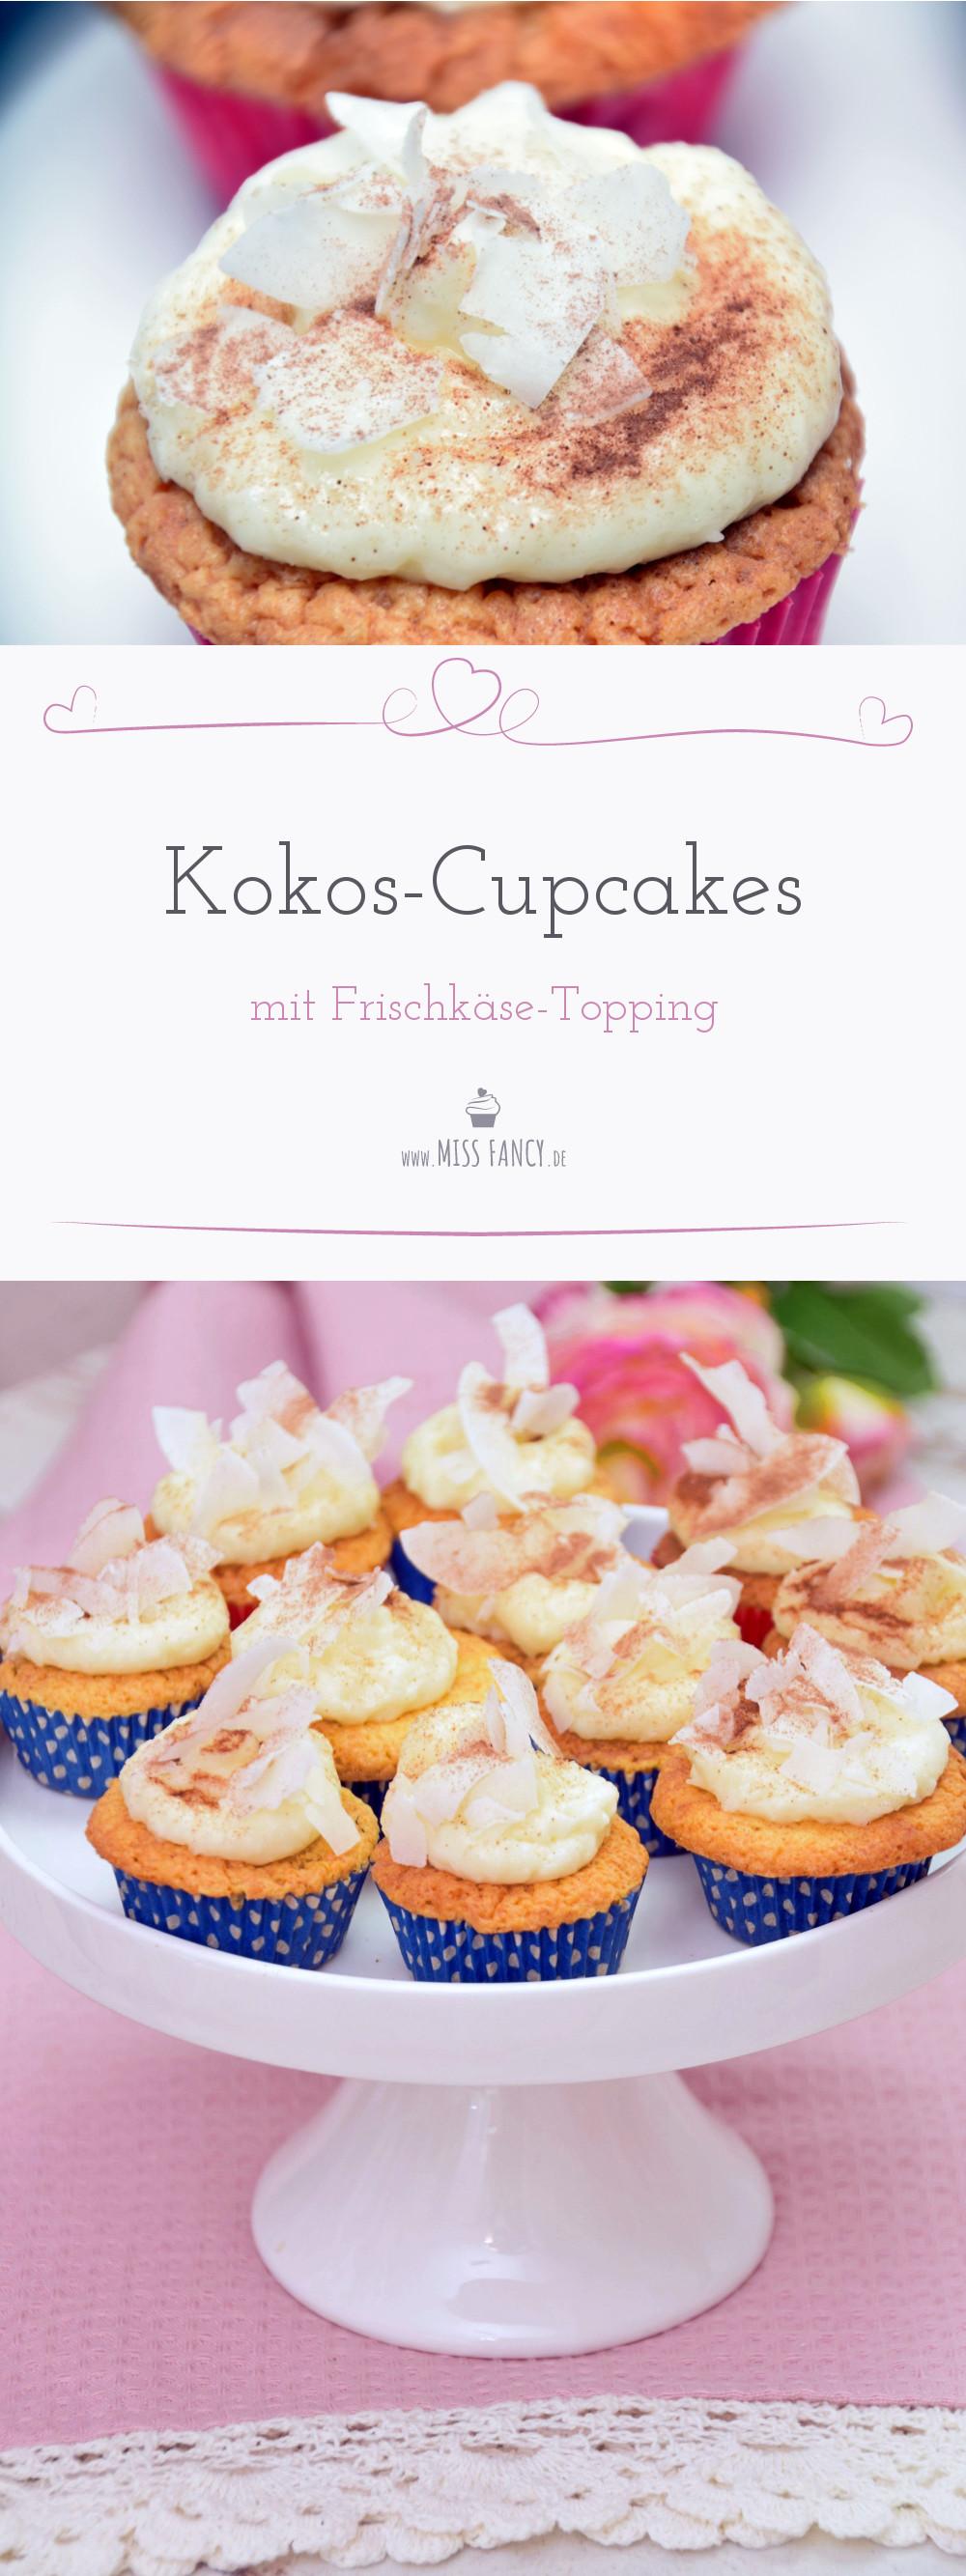 Kokos Cupcakes rezept missfancy